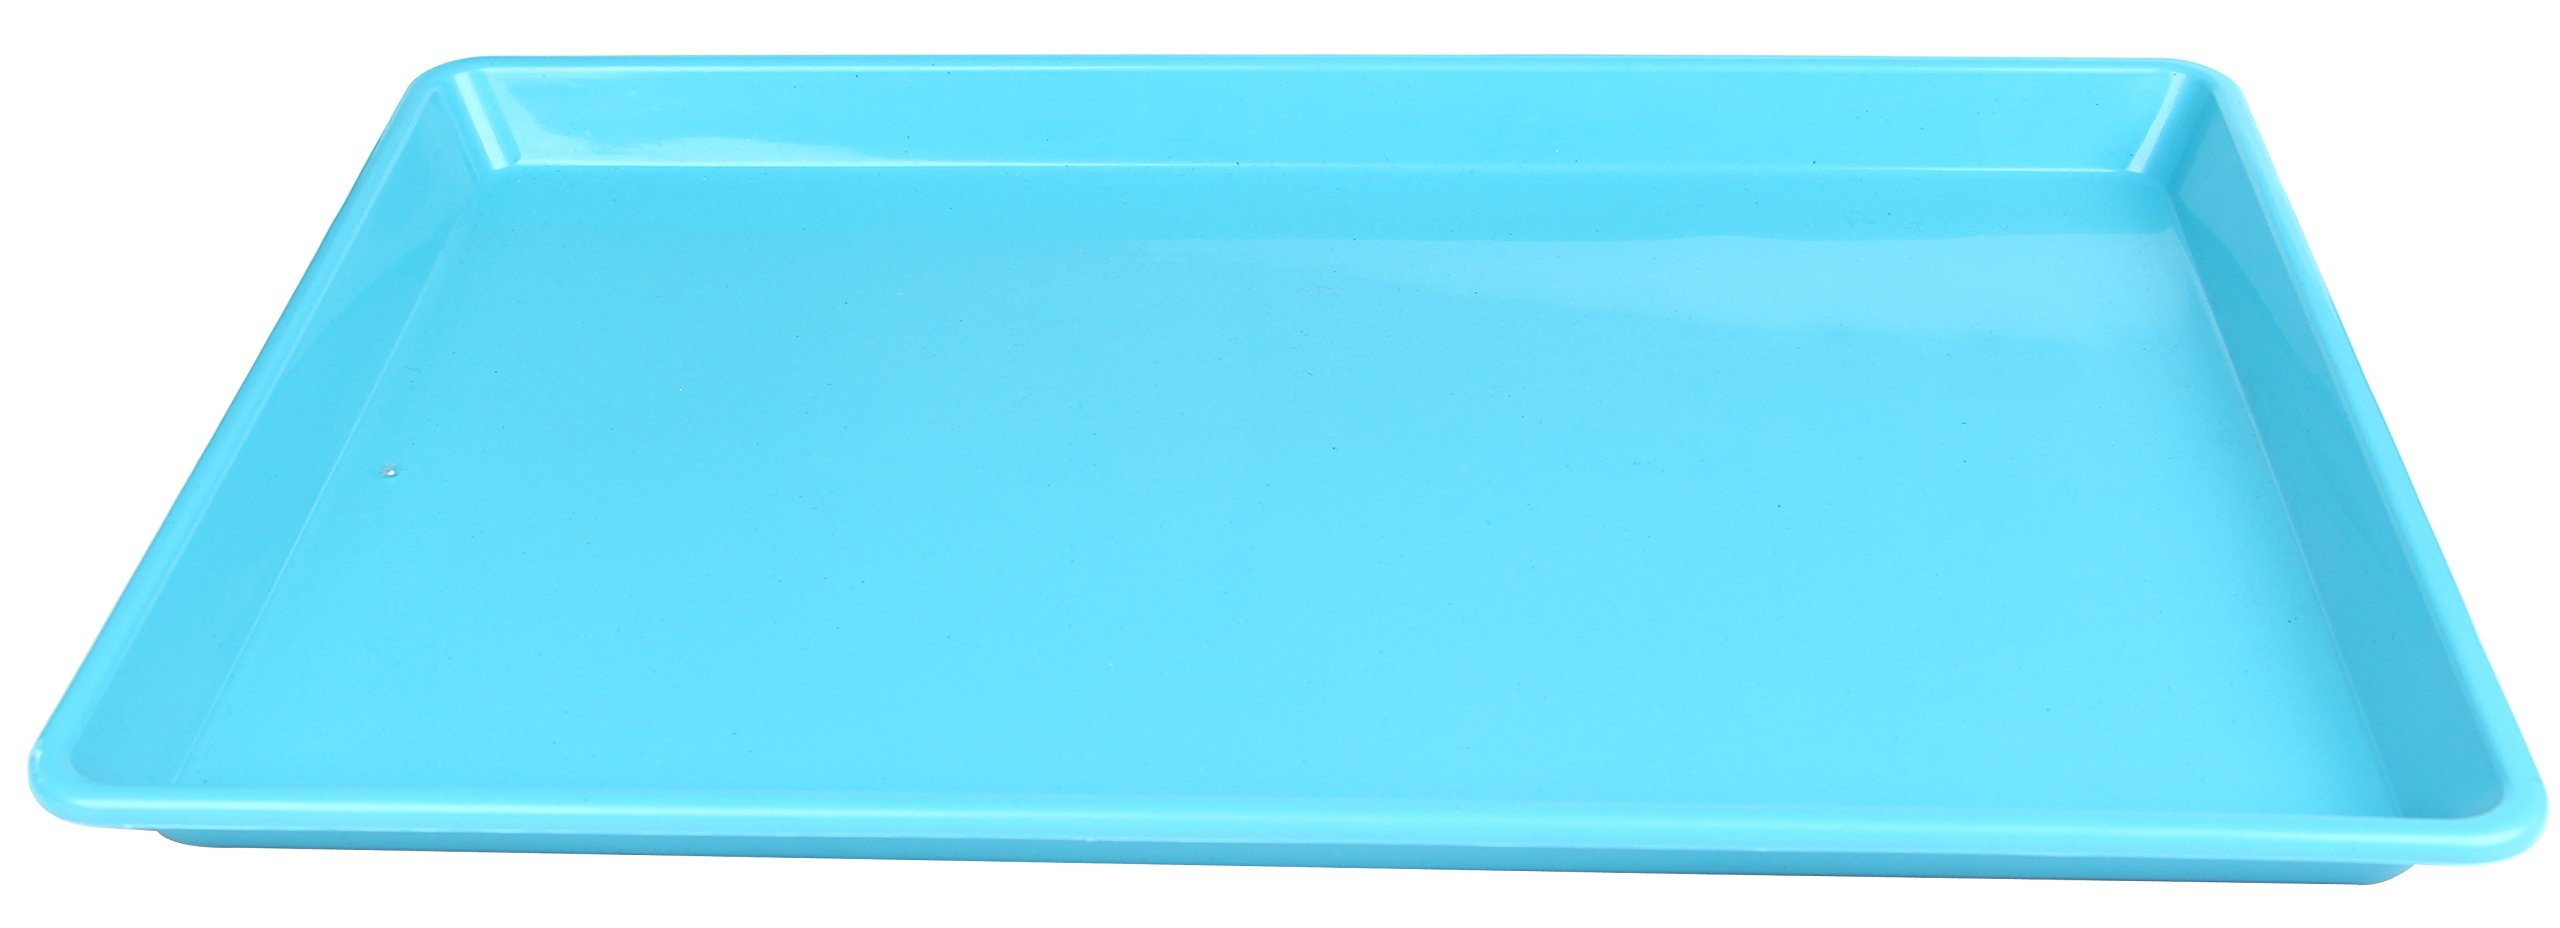 Pustor Silicone Waterproof Pet Food Mat Non Slip Tray Dog Feeding Mat for Floor